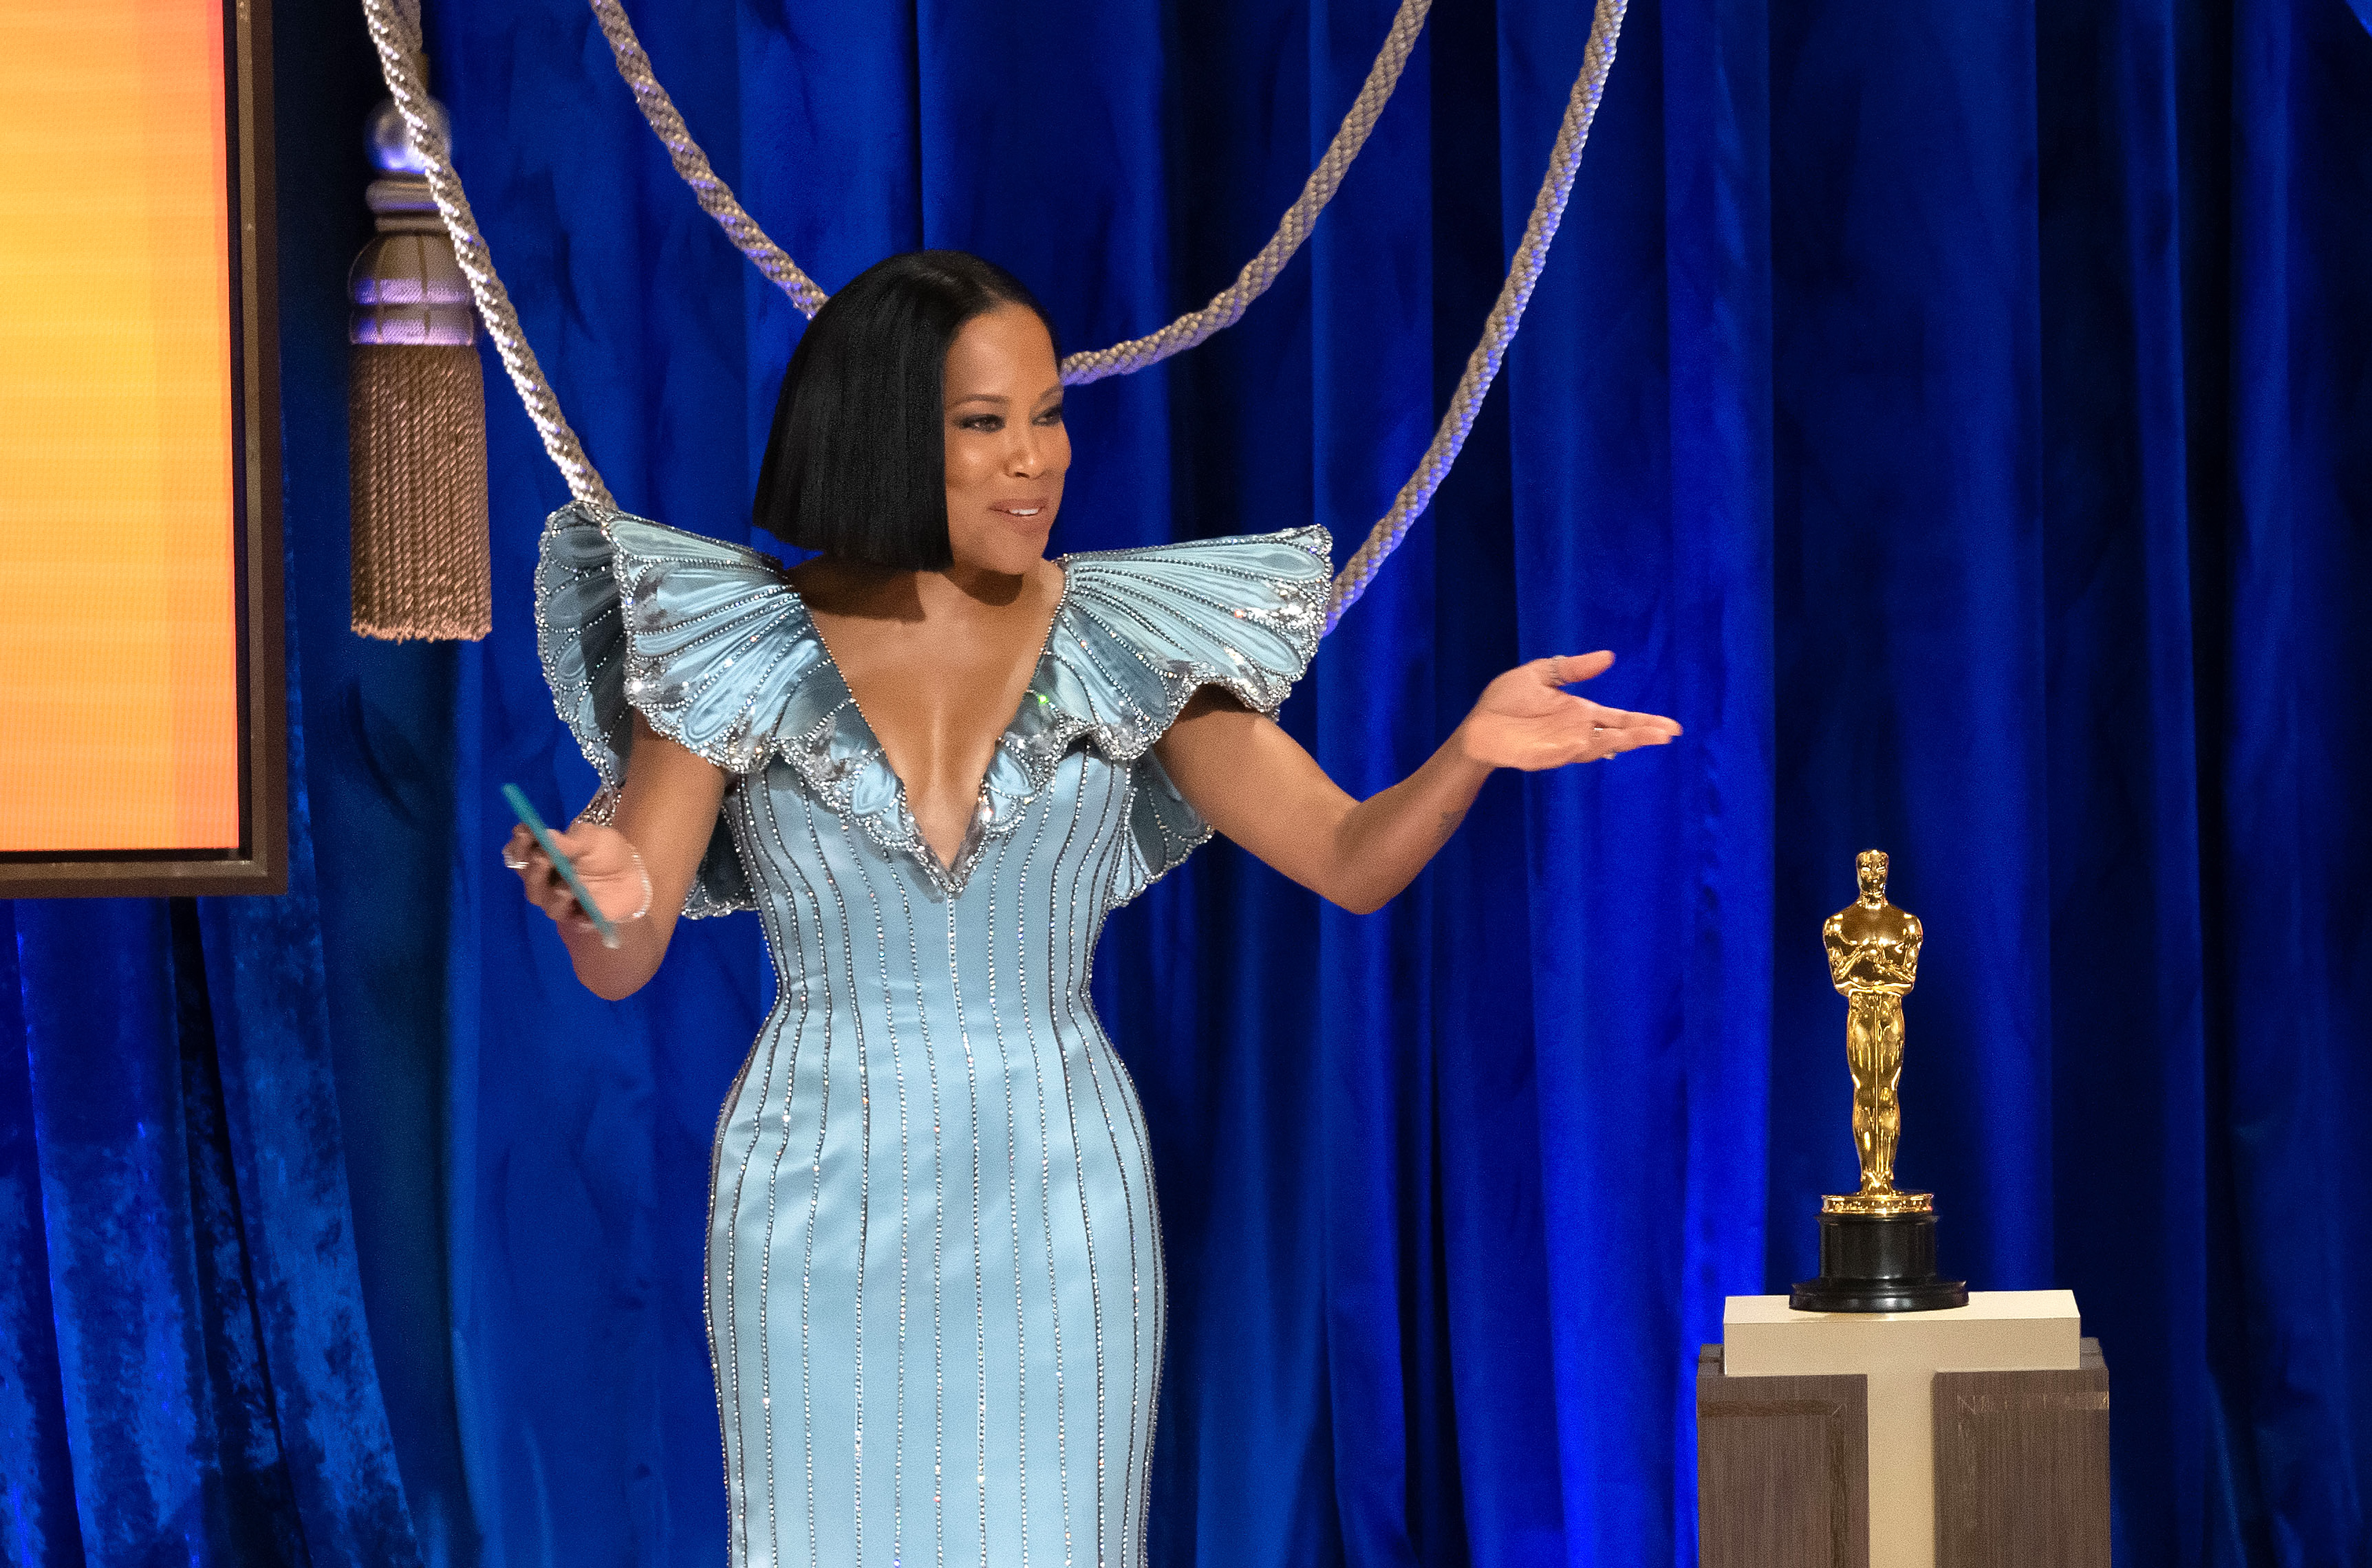 Regina King opening the 2021 Oscars on April 25, 2021